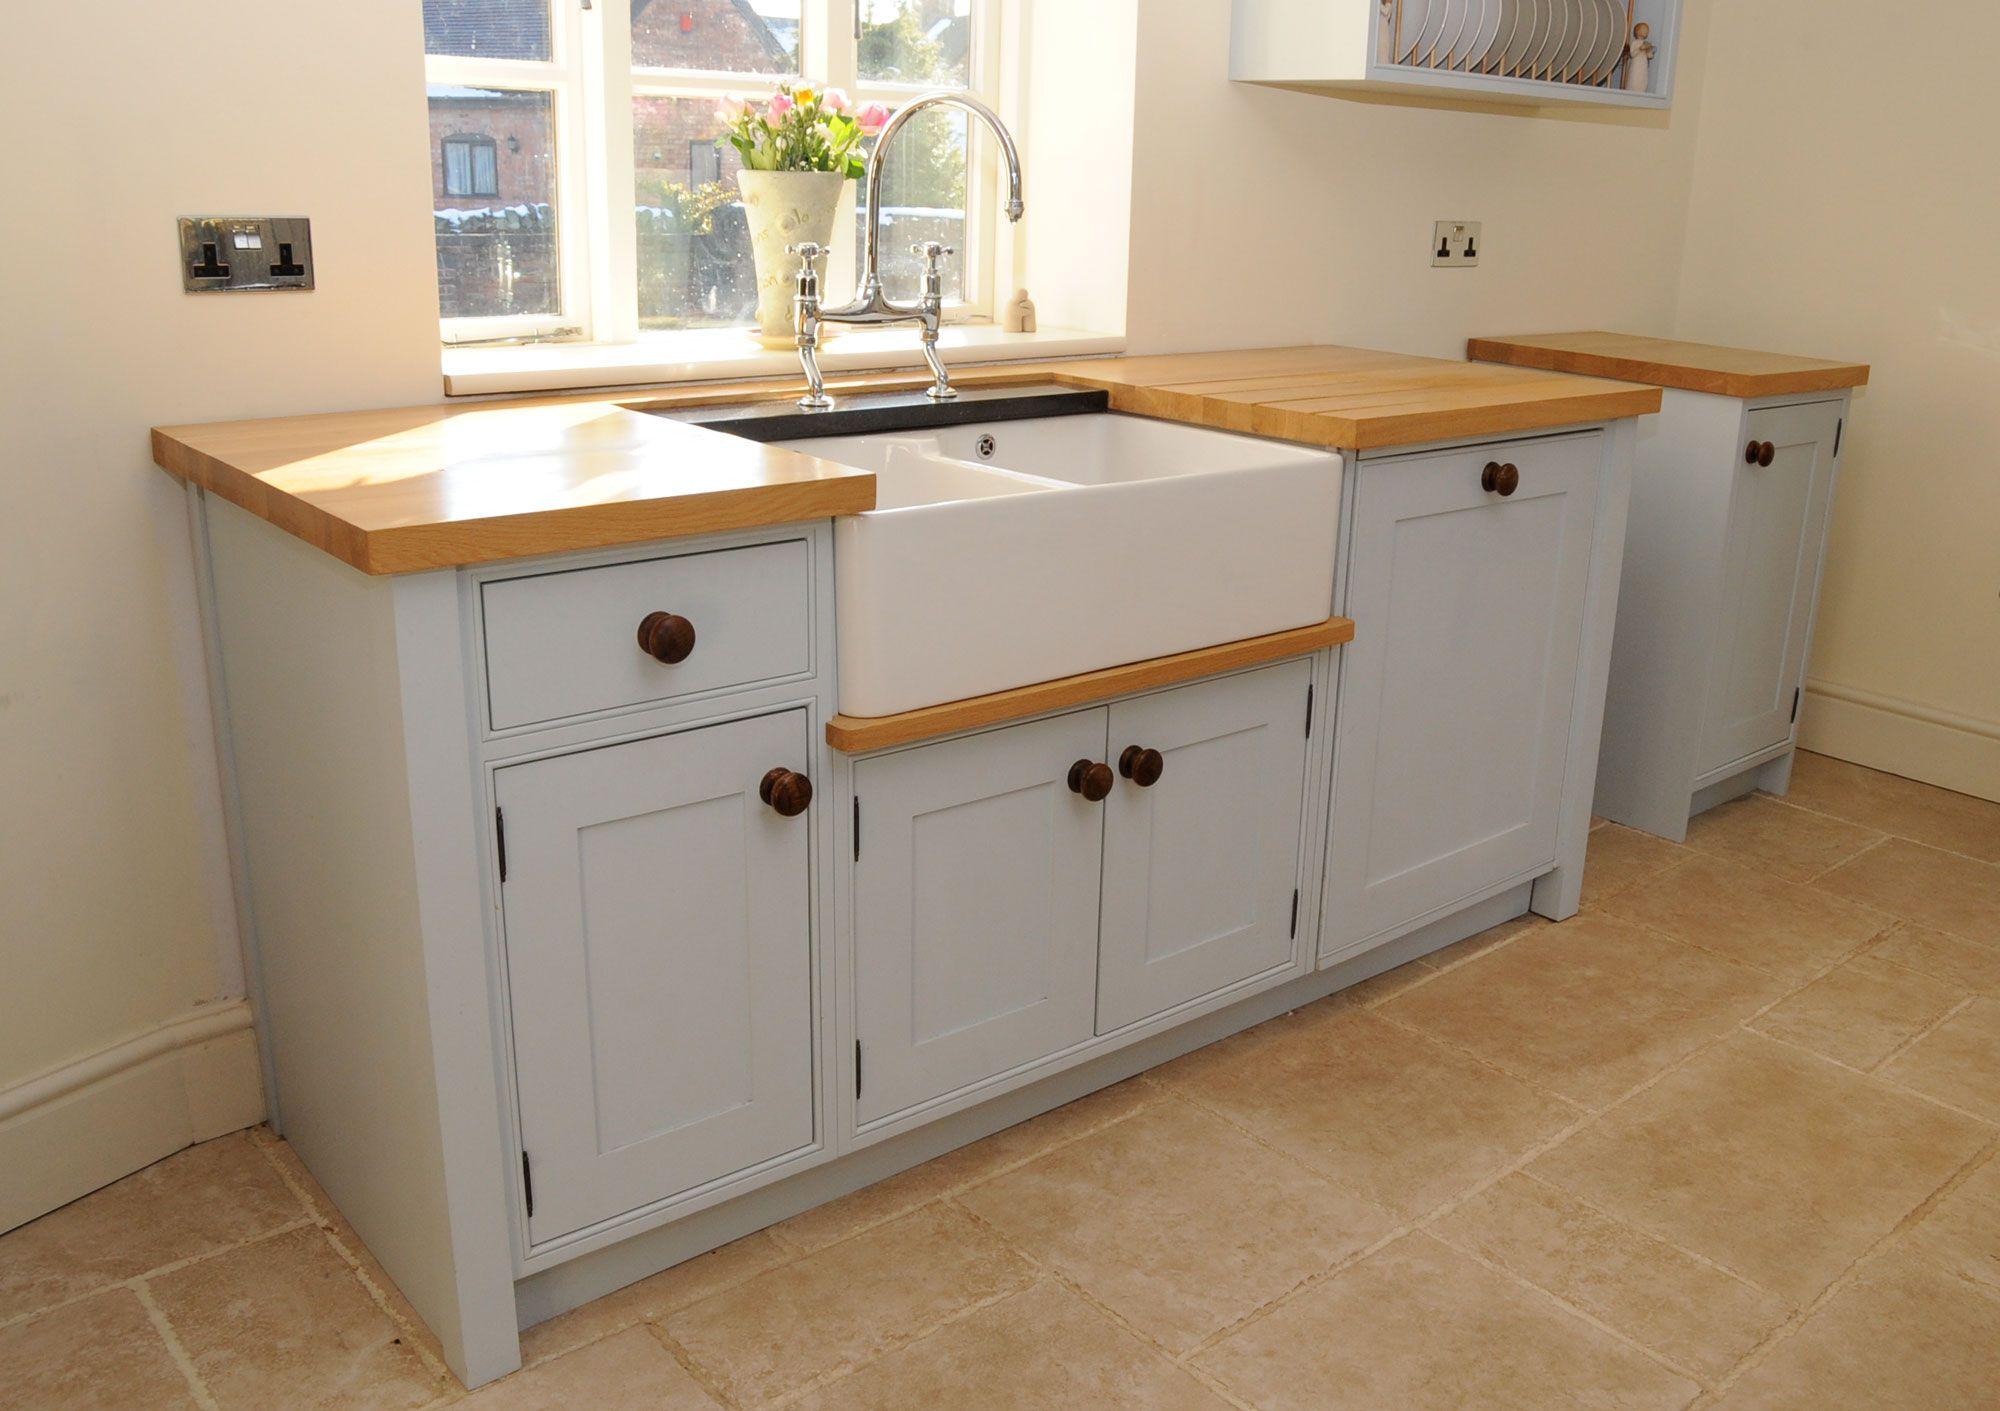 Free Standing Kitchen | Freestanding kitchen, Free ...